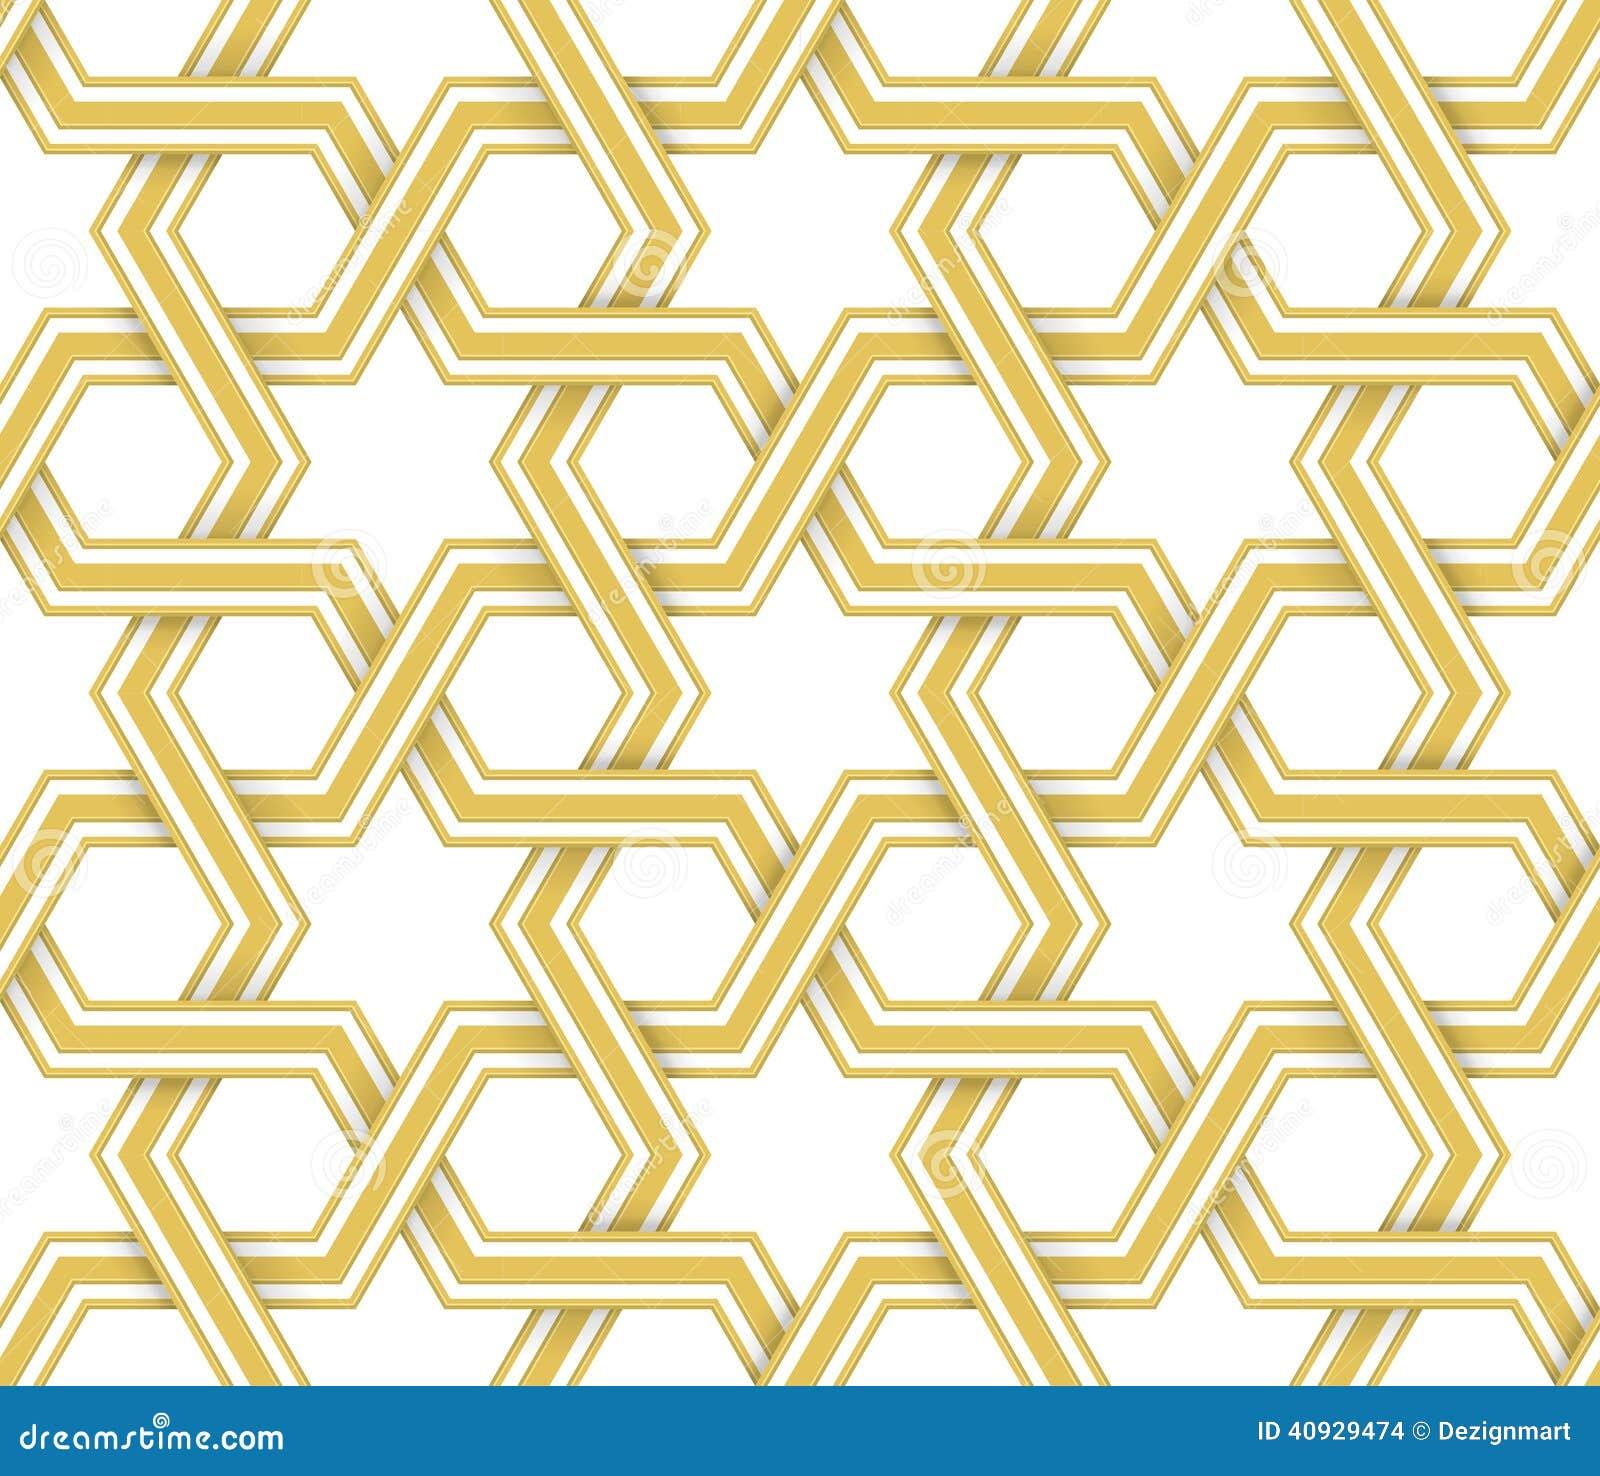 Islamic Geometric Vector Pattern Stock Vector - Image: 40929474 Easy Arabesque Art